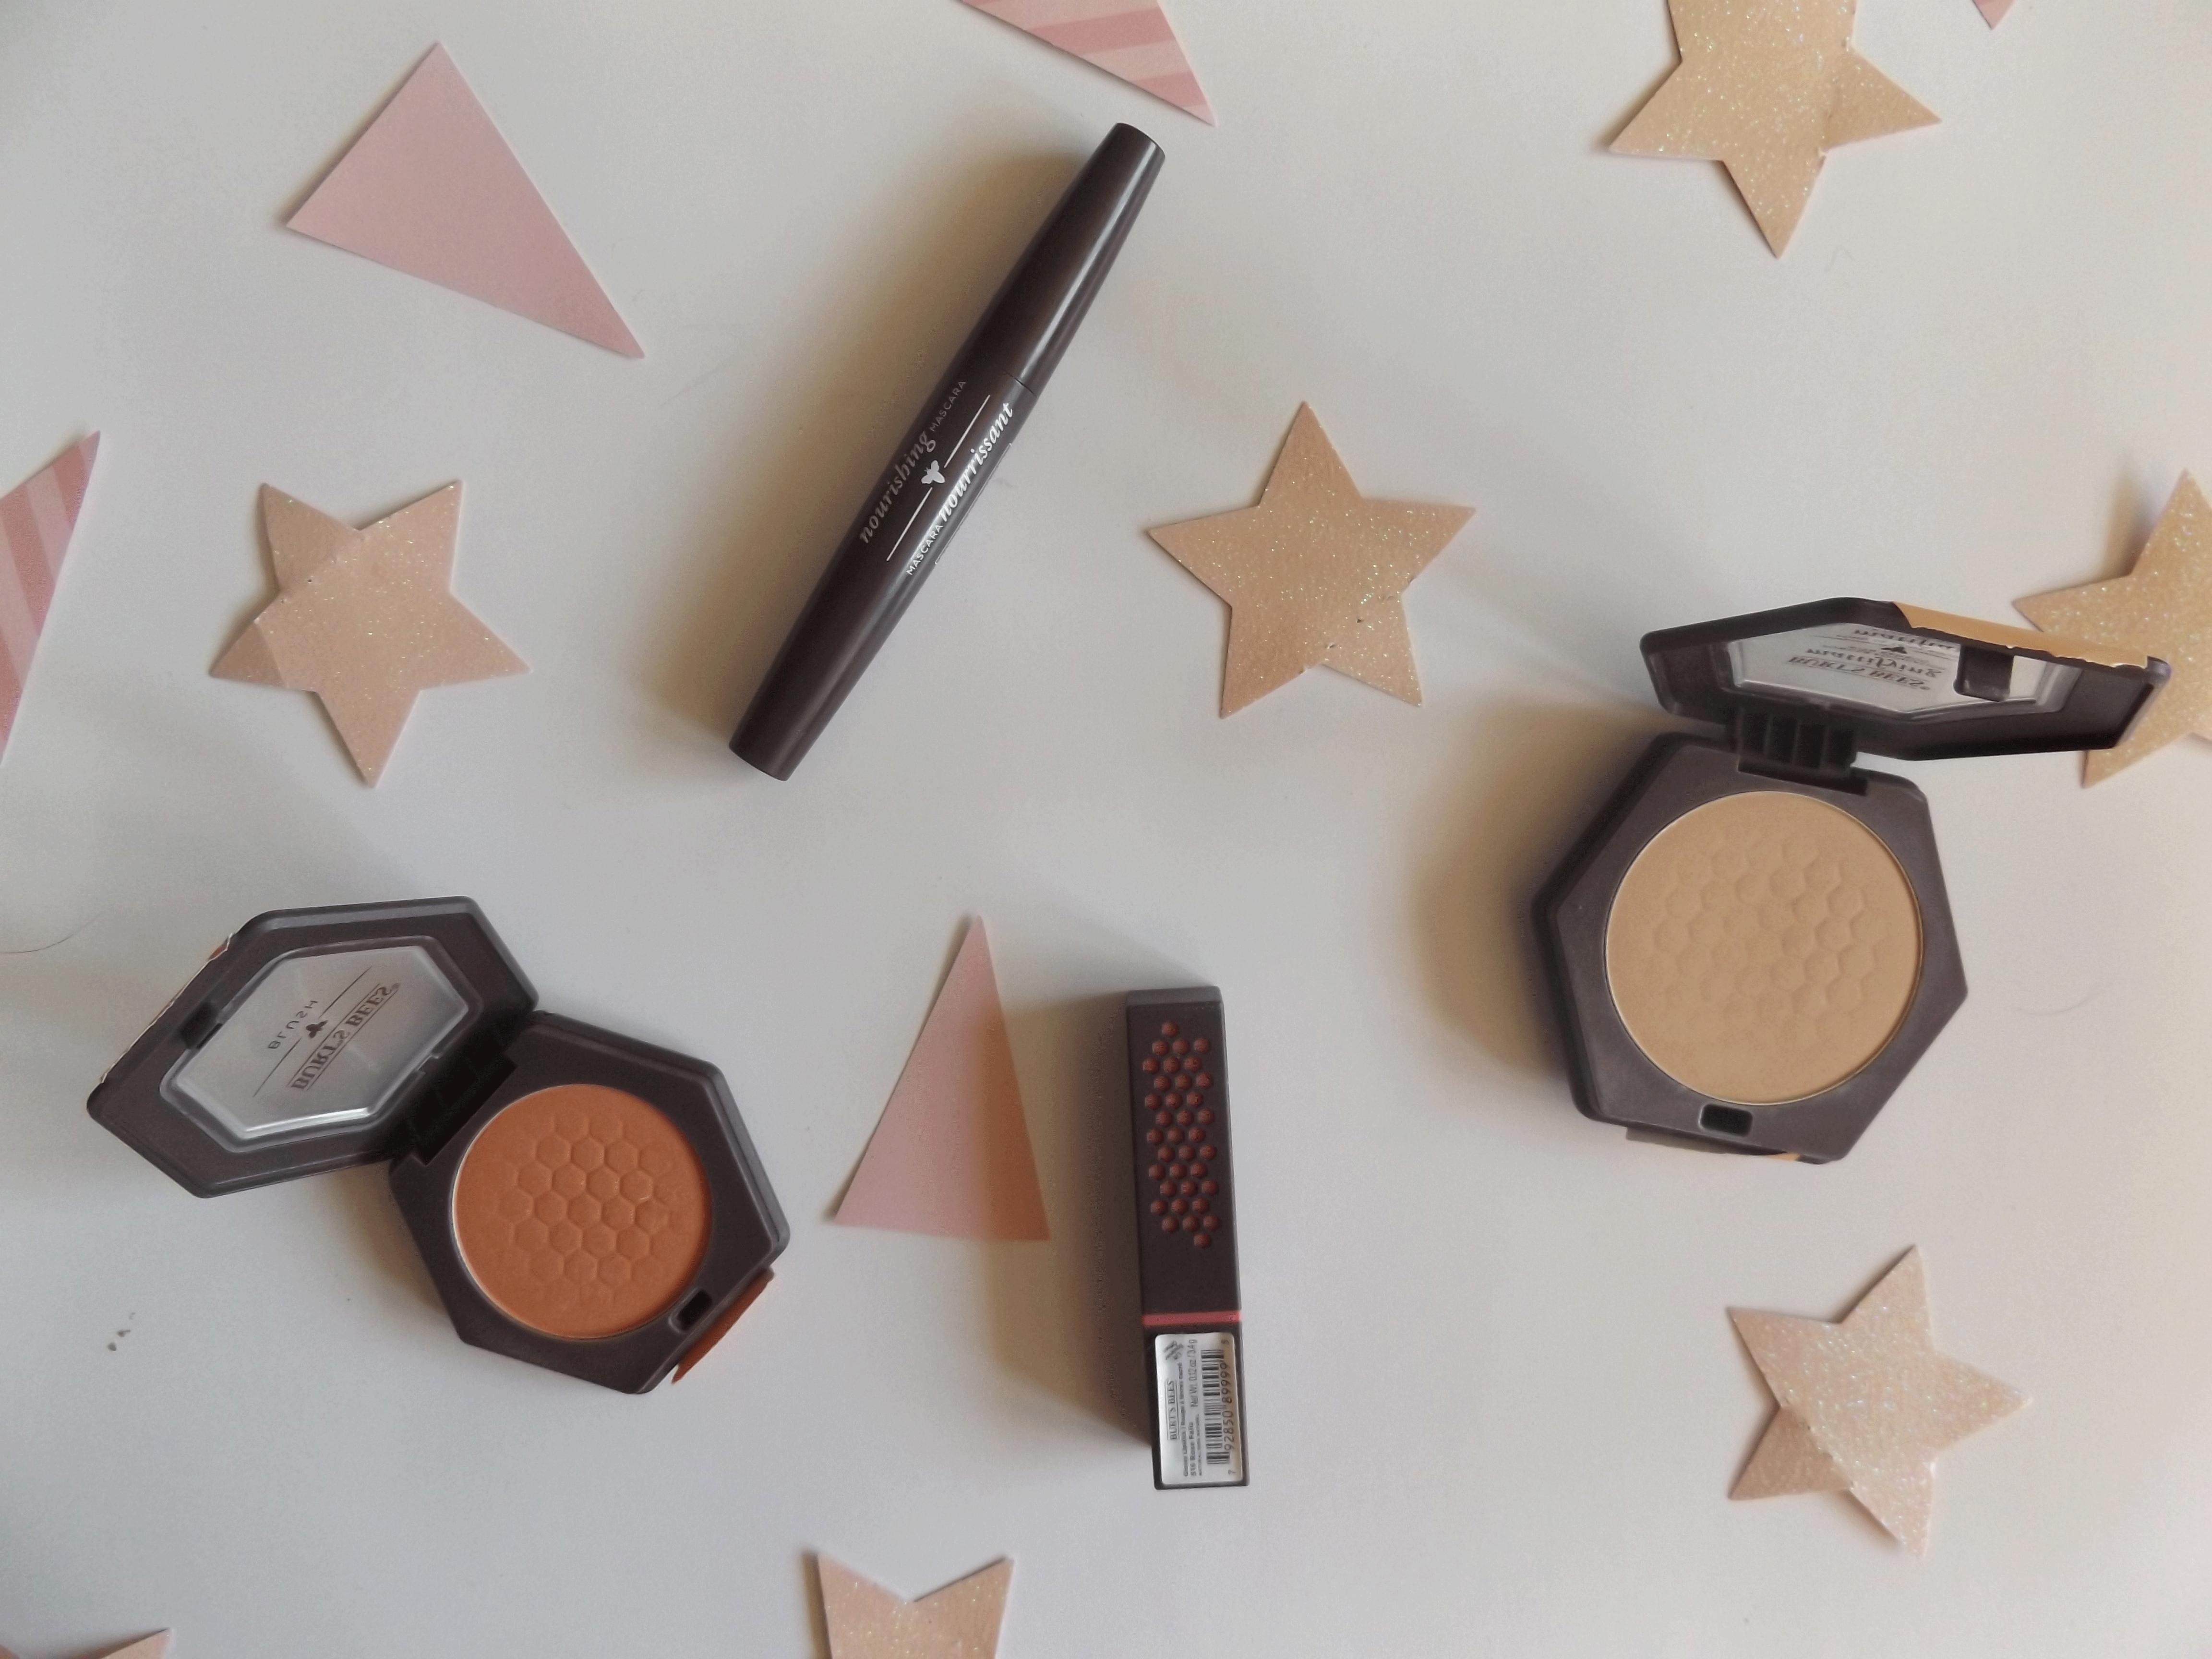 Mascara, blush, foundation powder, lipstick